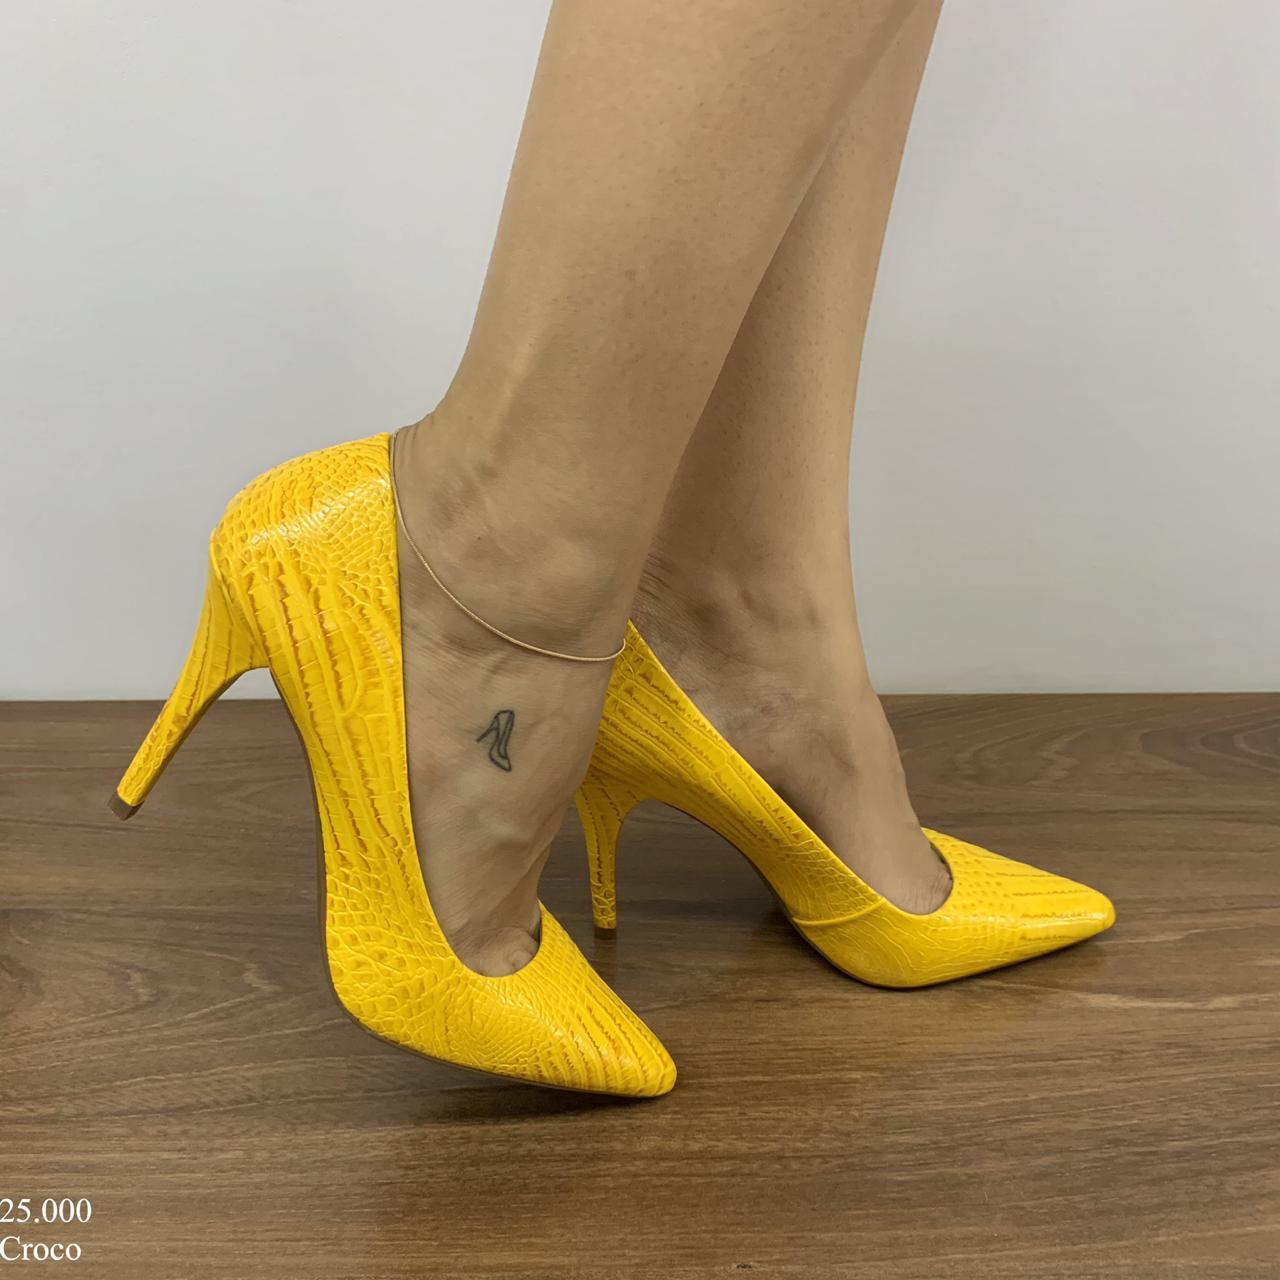 Scarpin Feminino Amarelo Croco | D-25.000-39